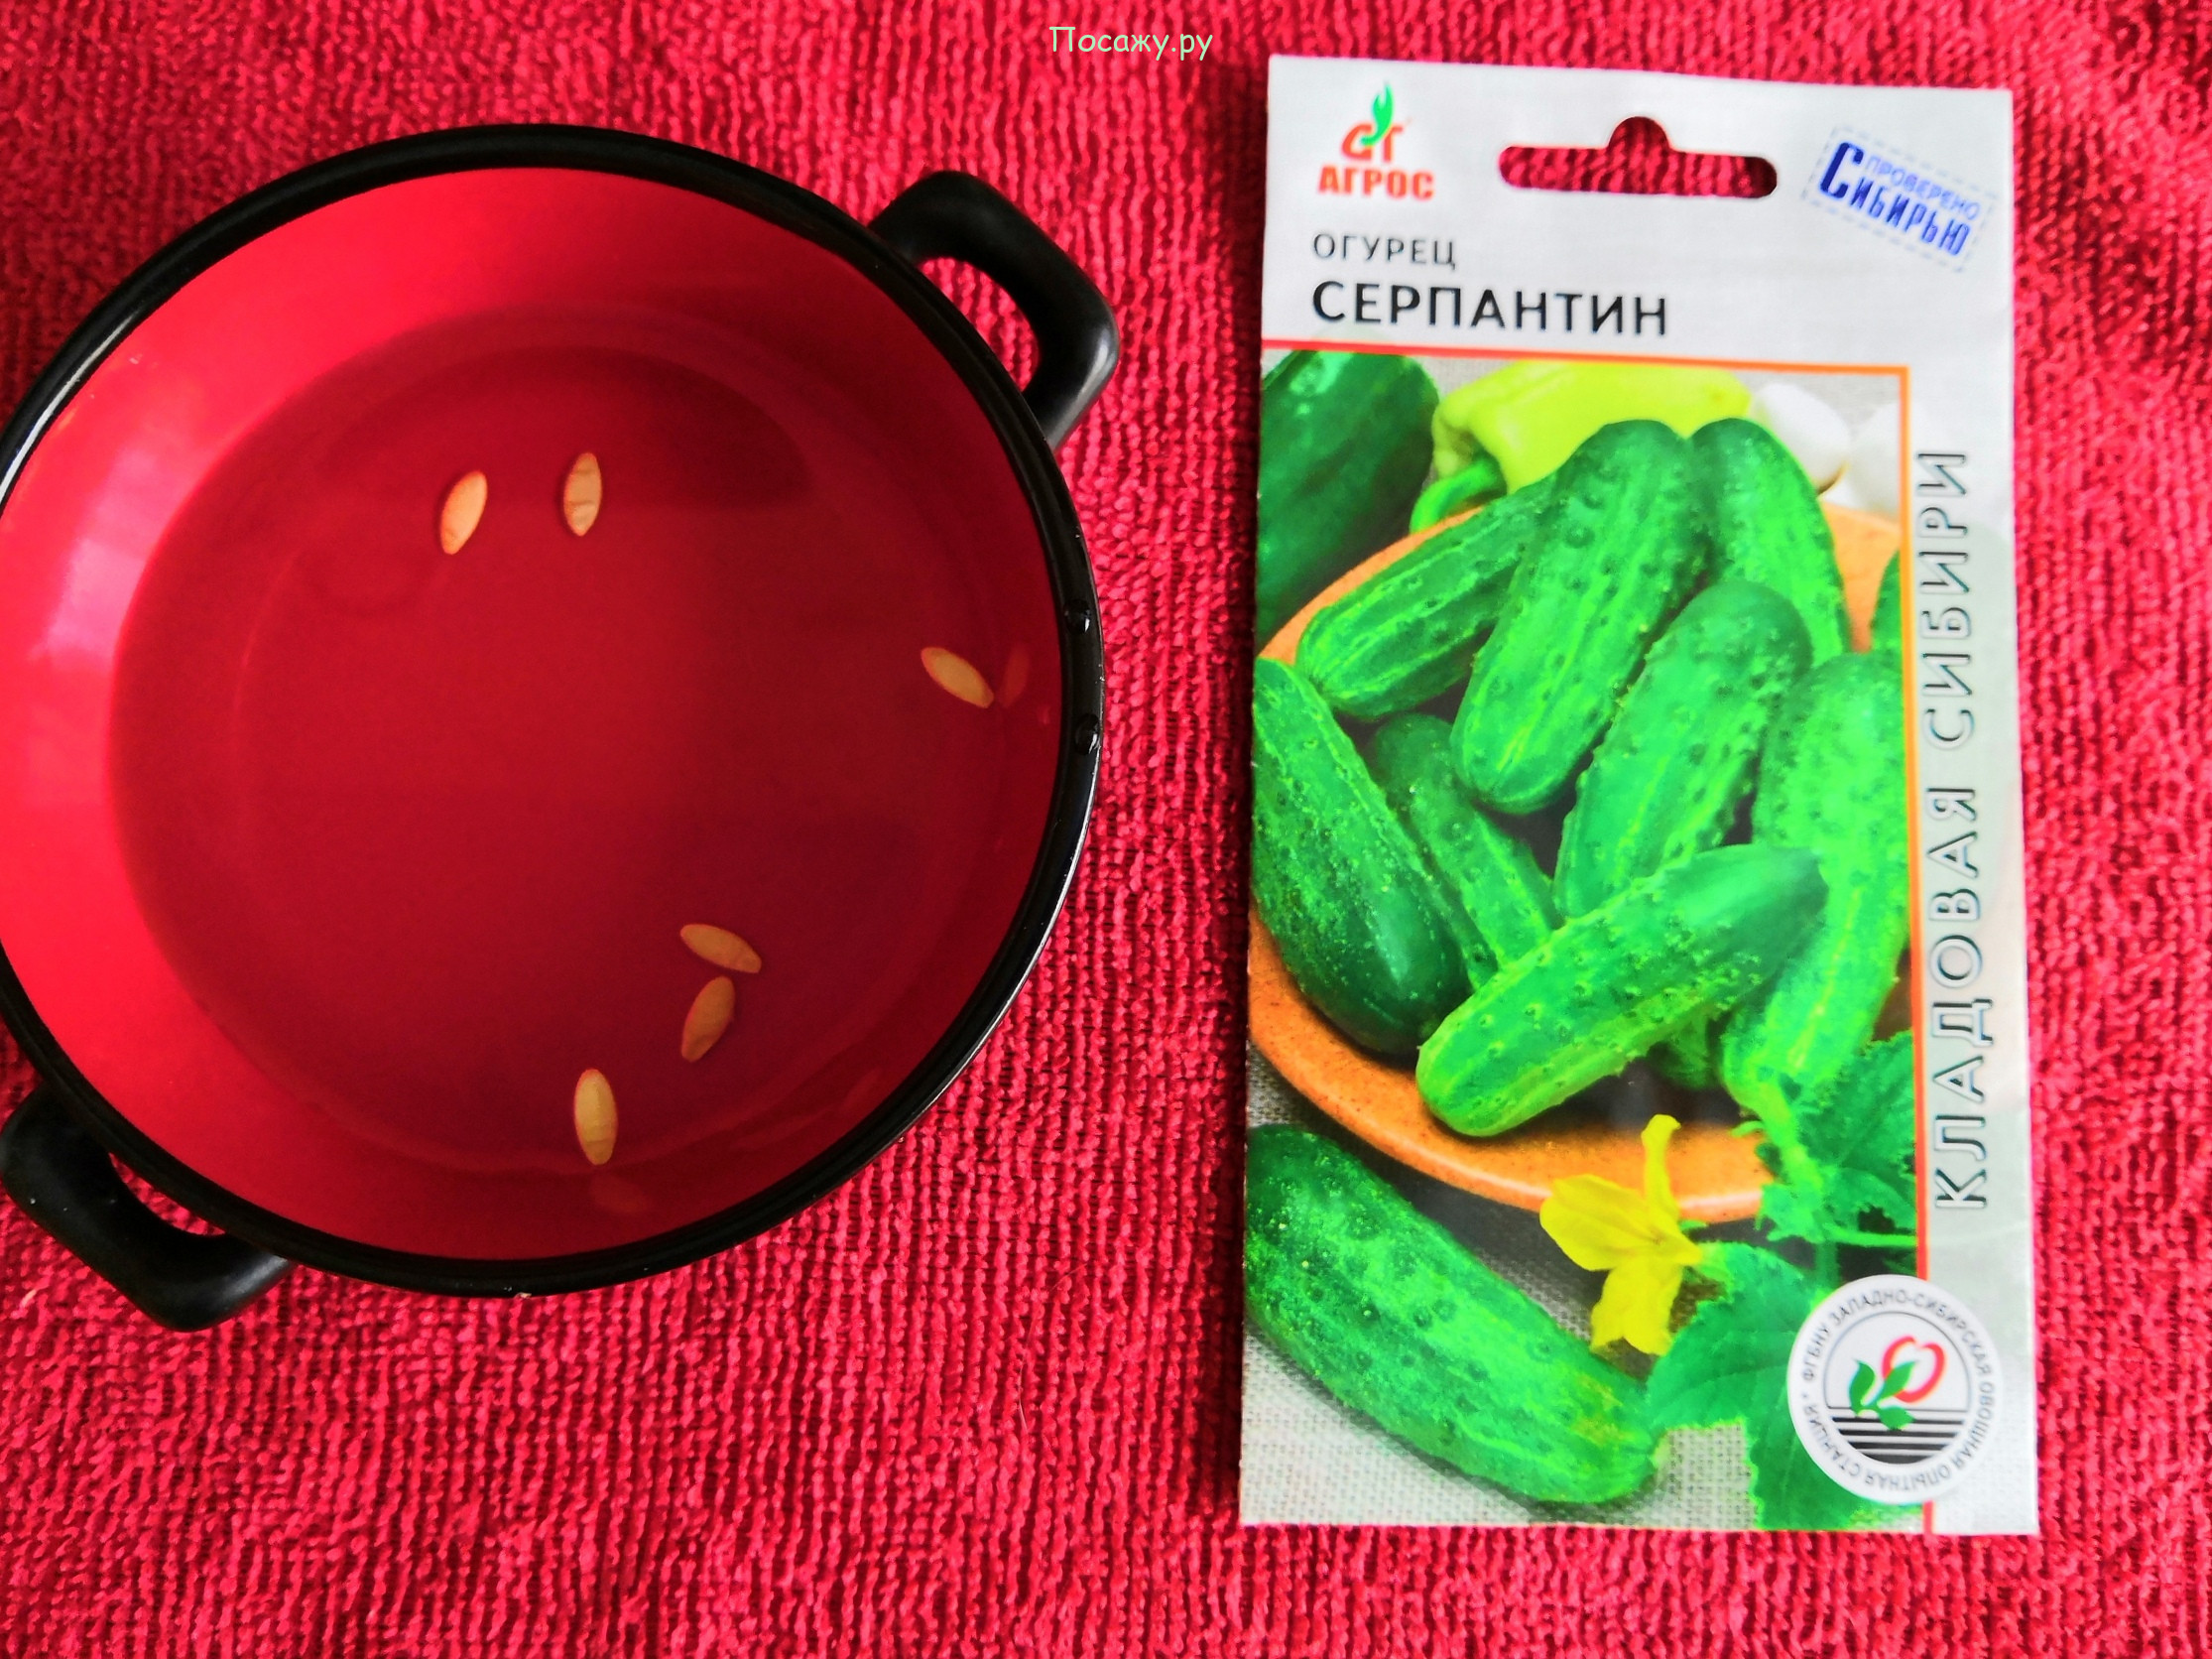 Как сеять огурцы серпантин